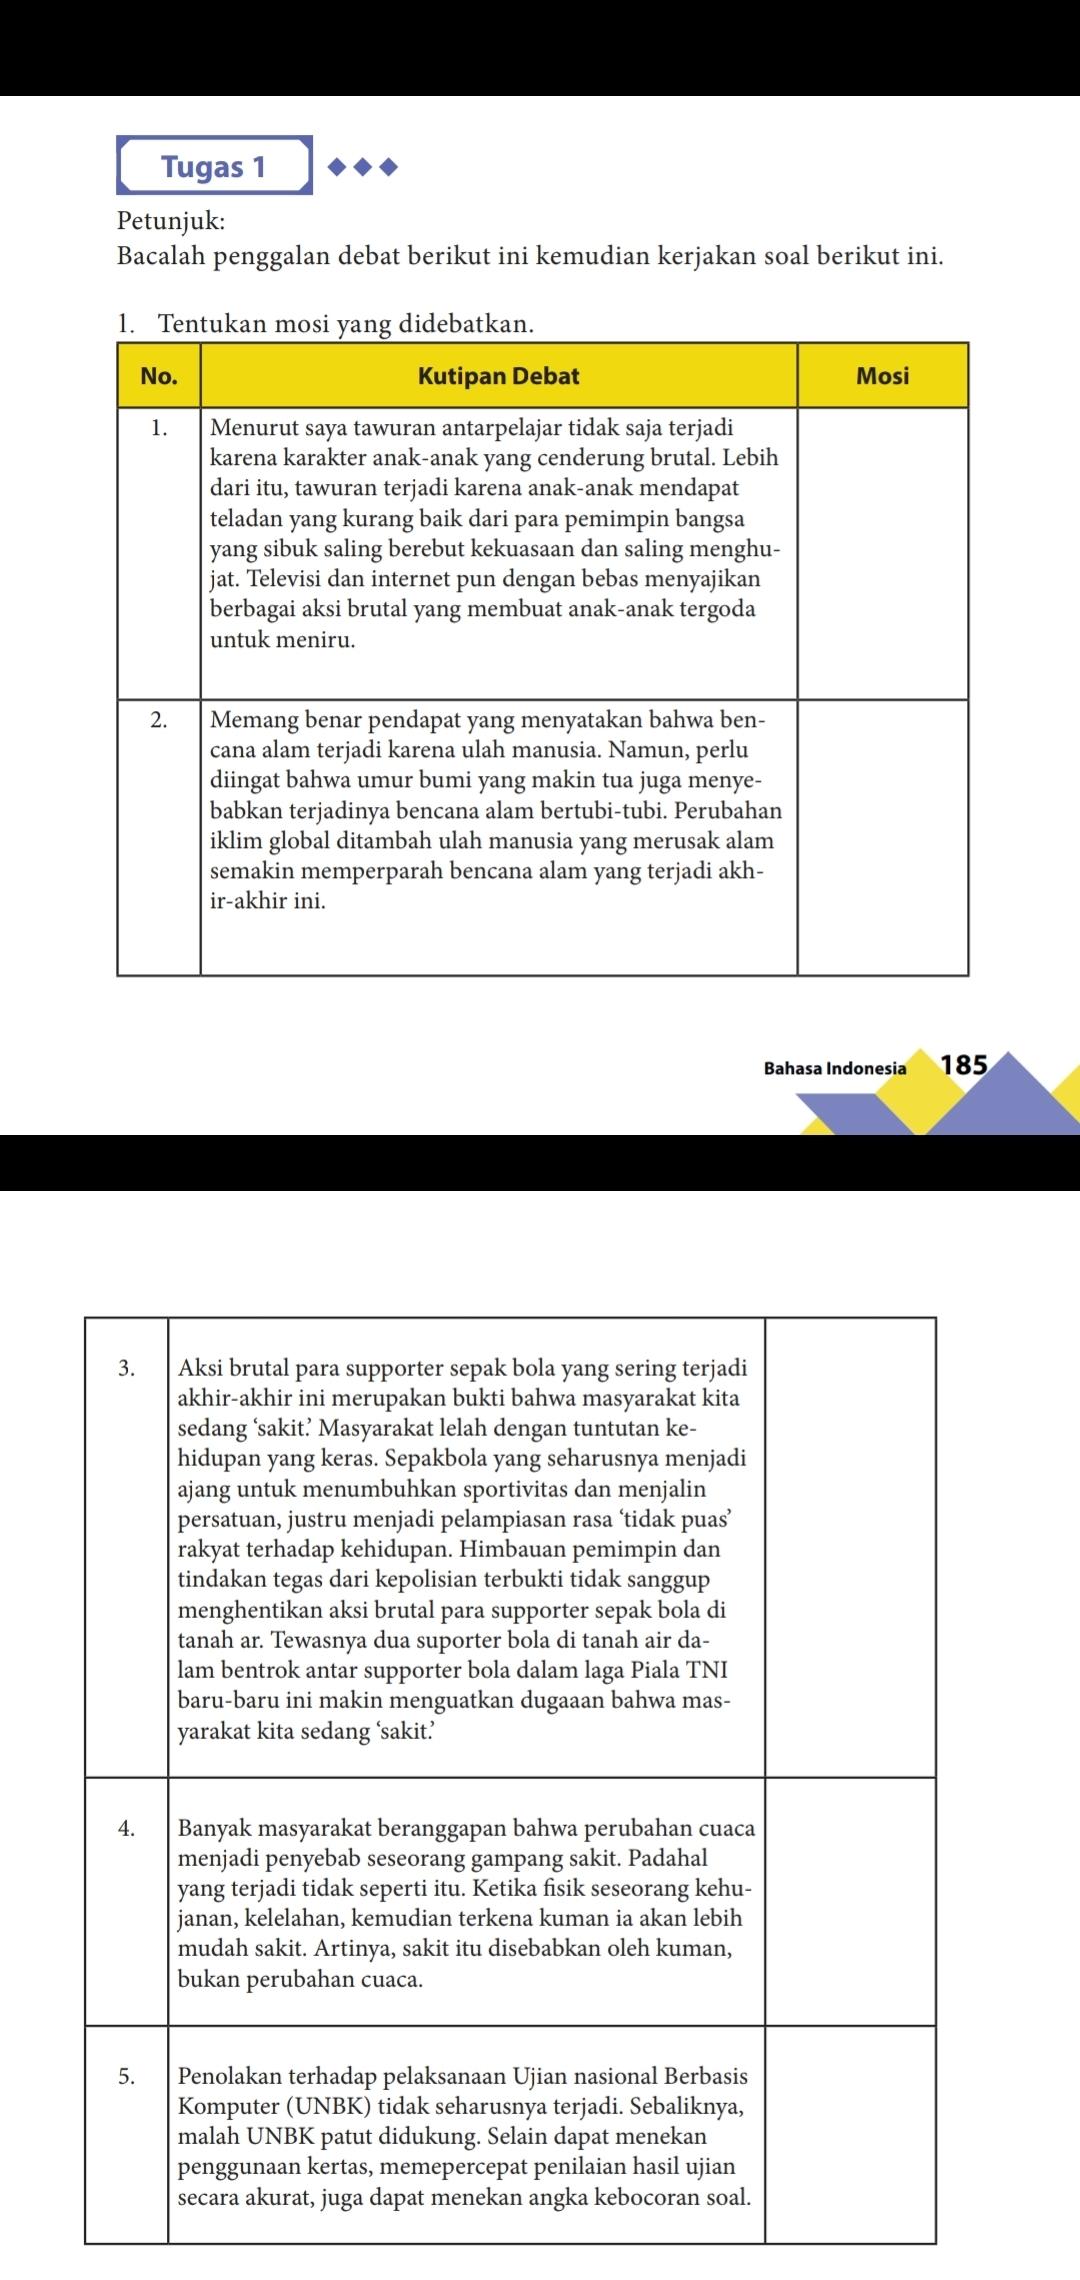 Bahasa Indonesia Kelas 10 : bahasa, indonesia, kelas, Paket, Bahasa, Indonesia, Kelas, Halaman, Brainly.co.id